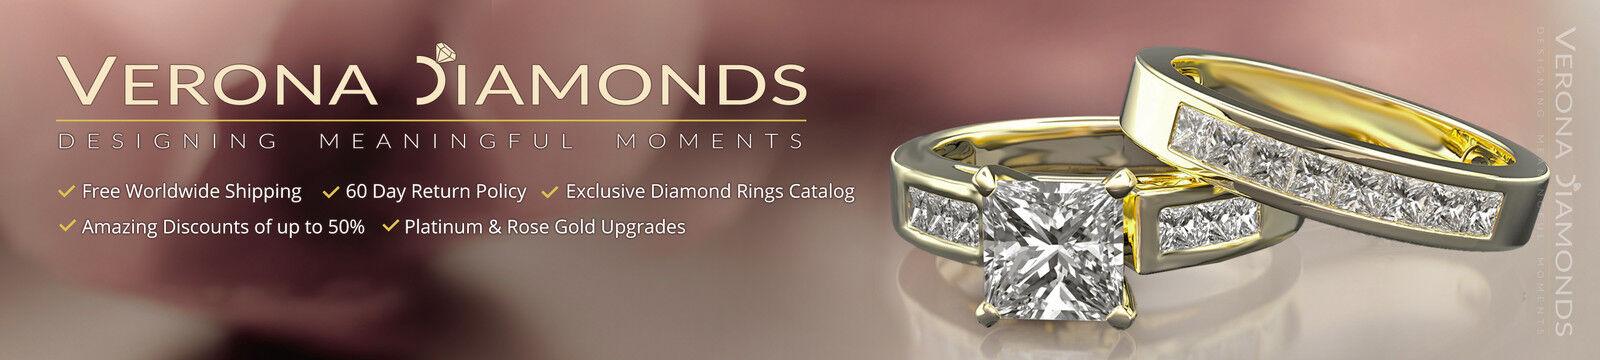 Items in Verona Diamonds store on eBay